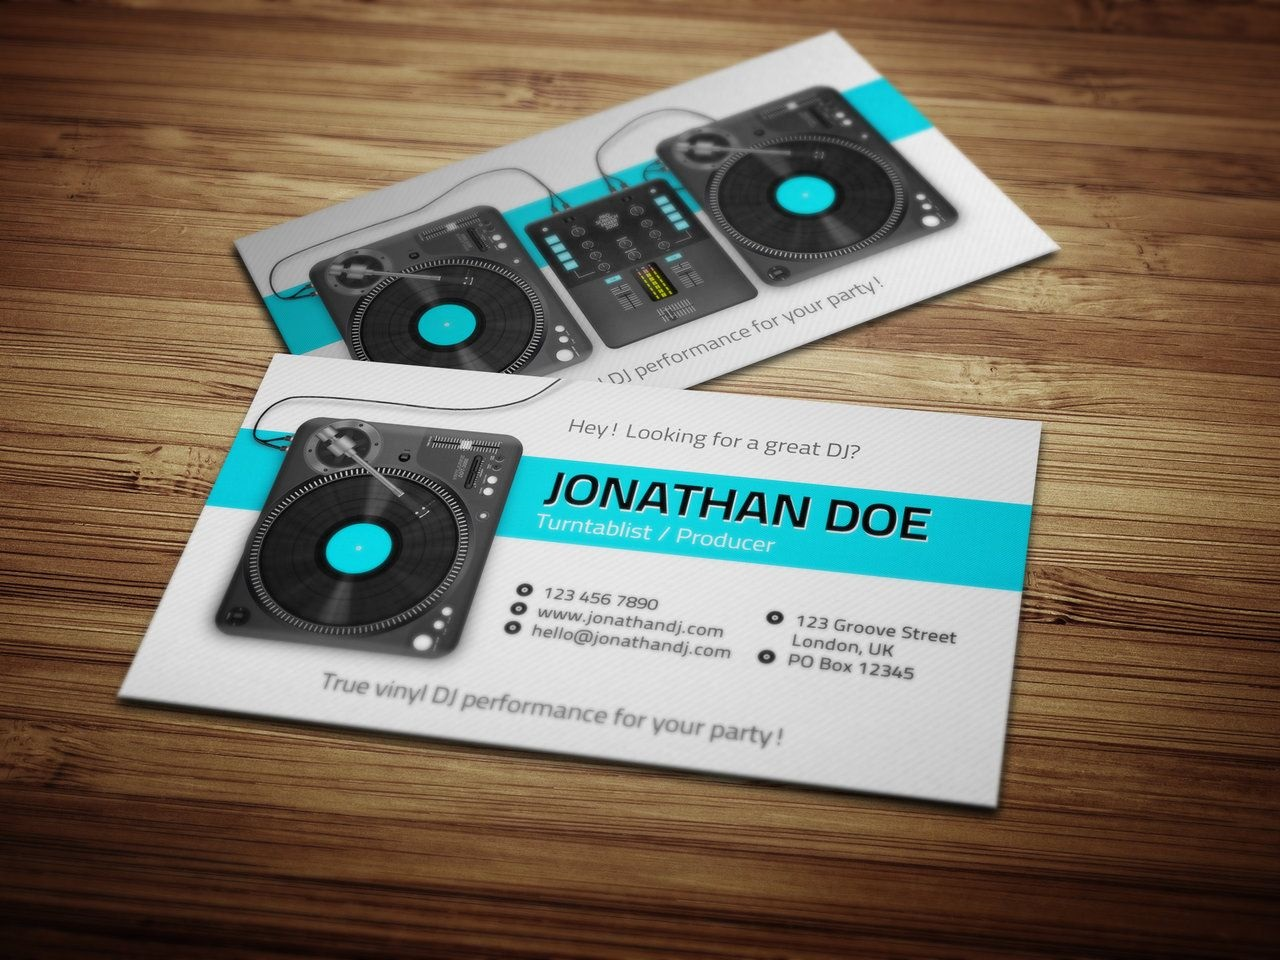 005 Unusual Dj Busines Card Template Design  Psd Free DownloadFull